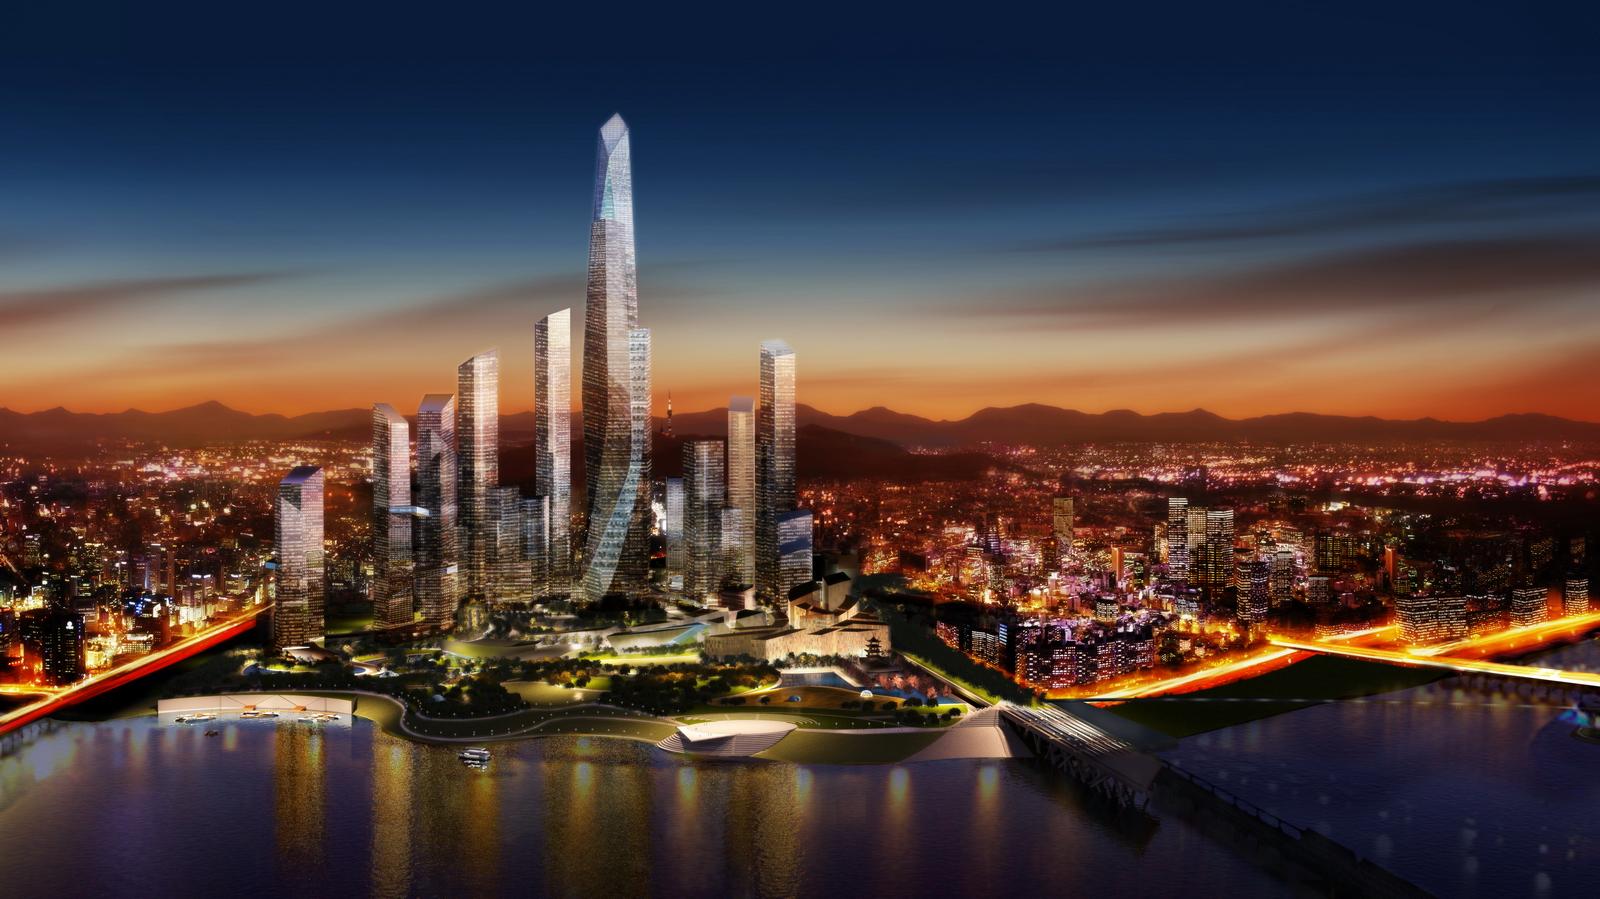 Seoul-Jeju-Seoul-Everland-Nami 6N5Đ - (ECO - Siêu tiết kiệm)